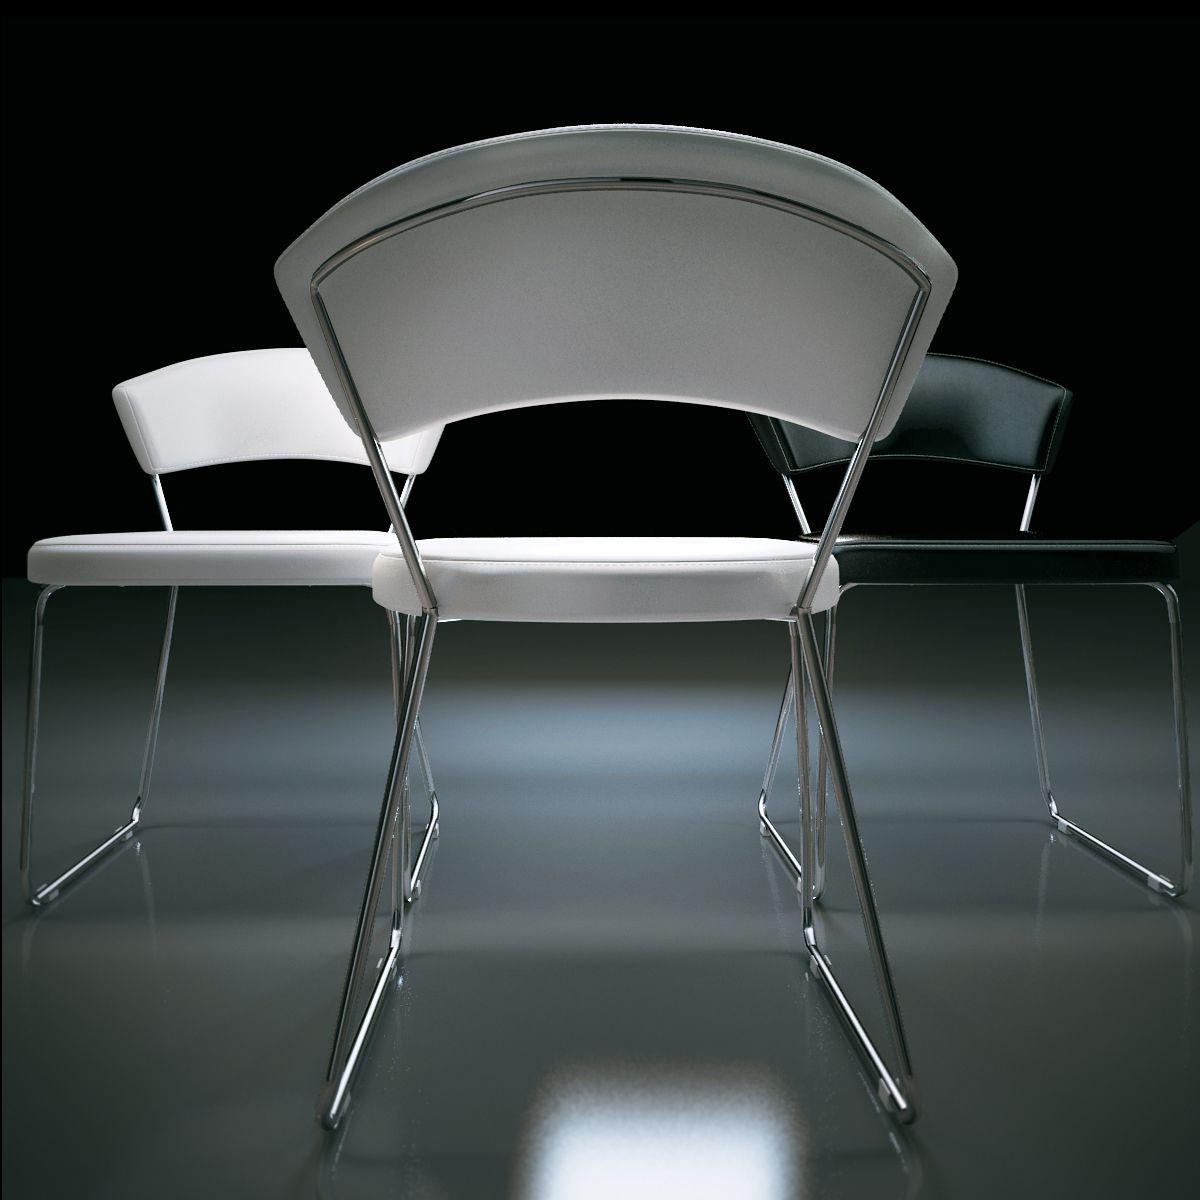 Diamond Dimple Closed Rocking Chair In 9 Kleuren - Delancy dining chair